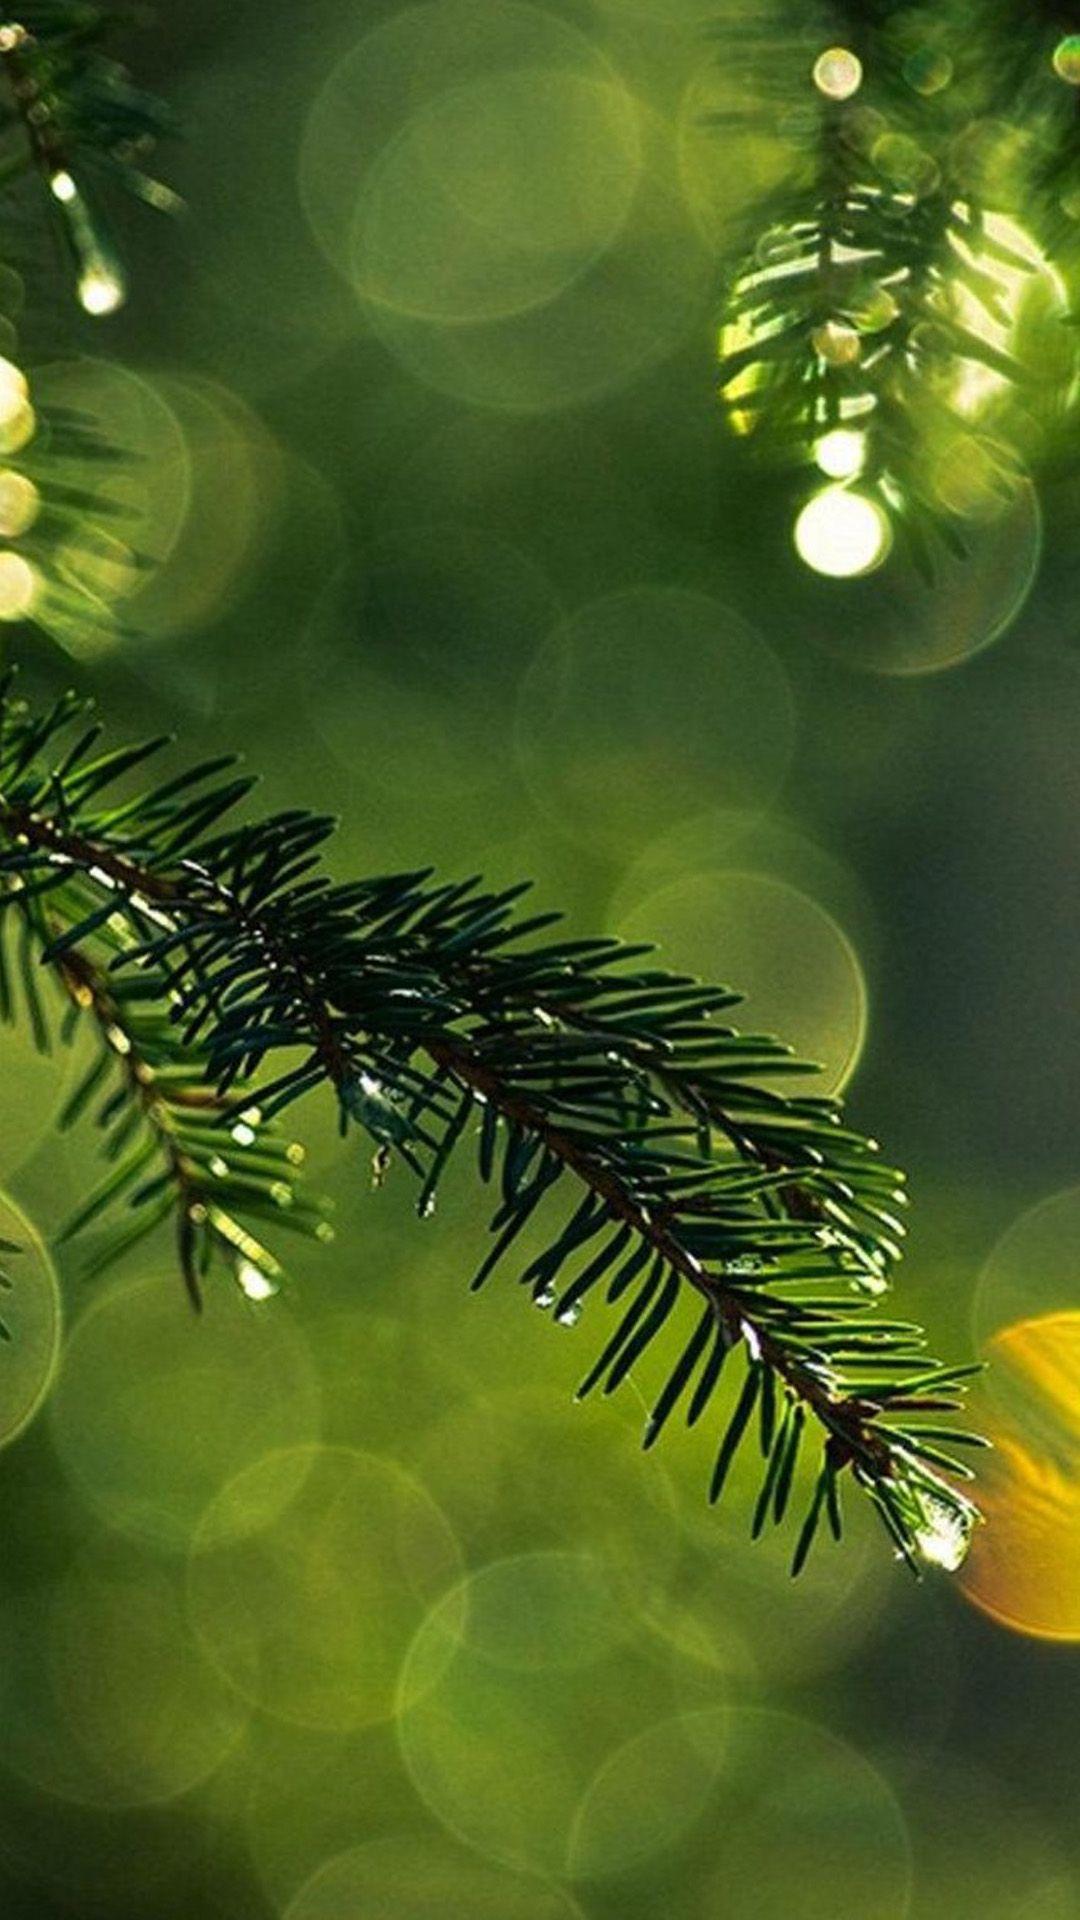 Nature dew pine tree leaf branch blur iphone 6 plus - Pine tree wallpaper iphone ...